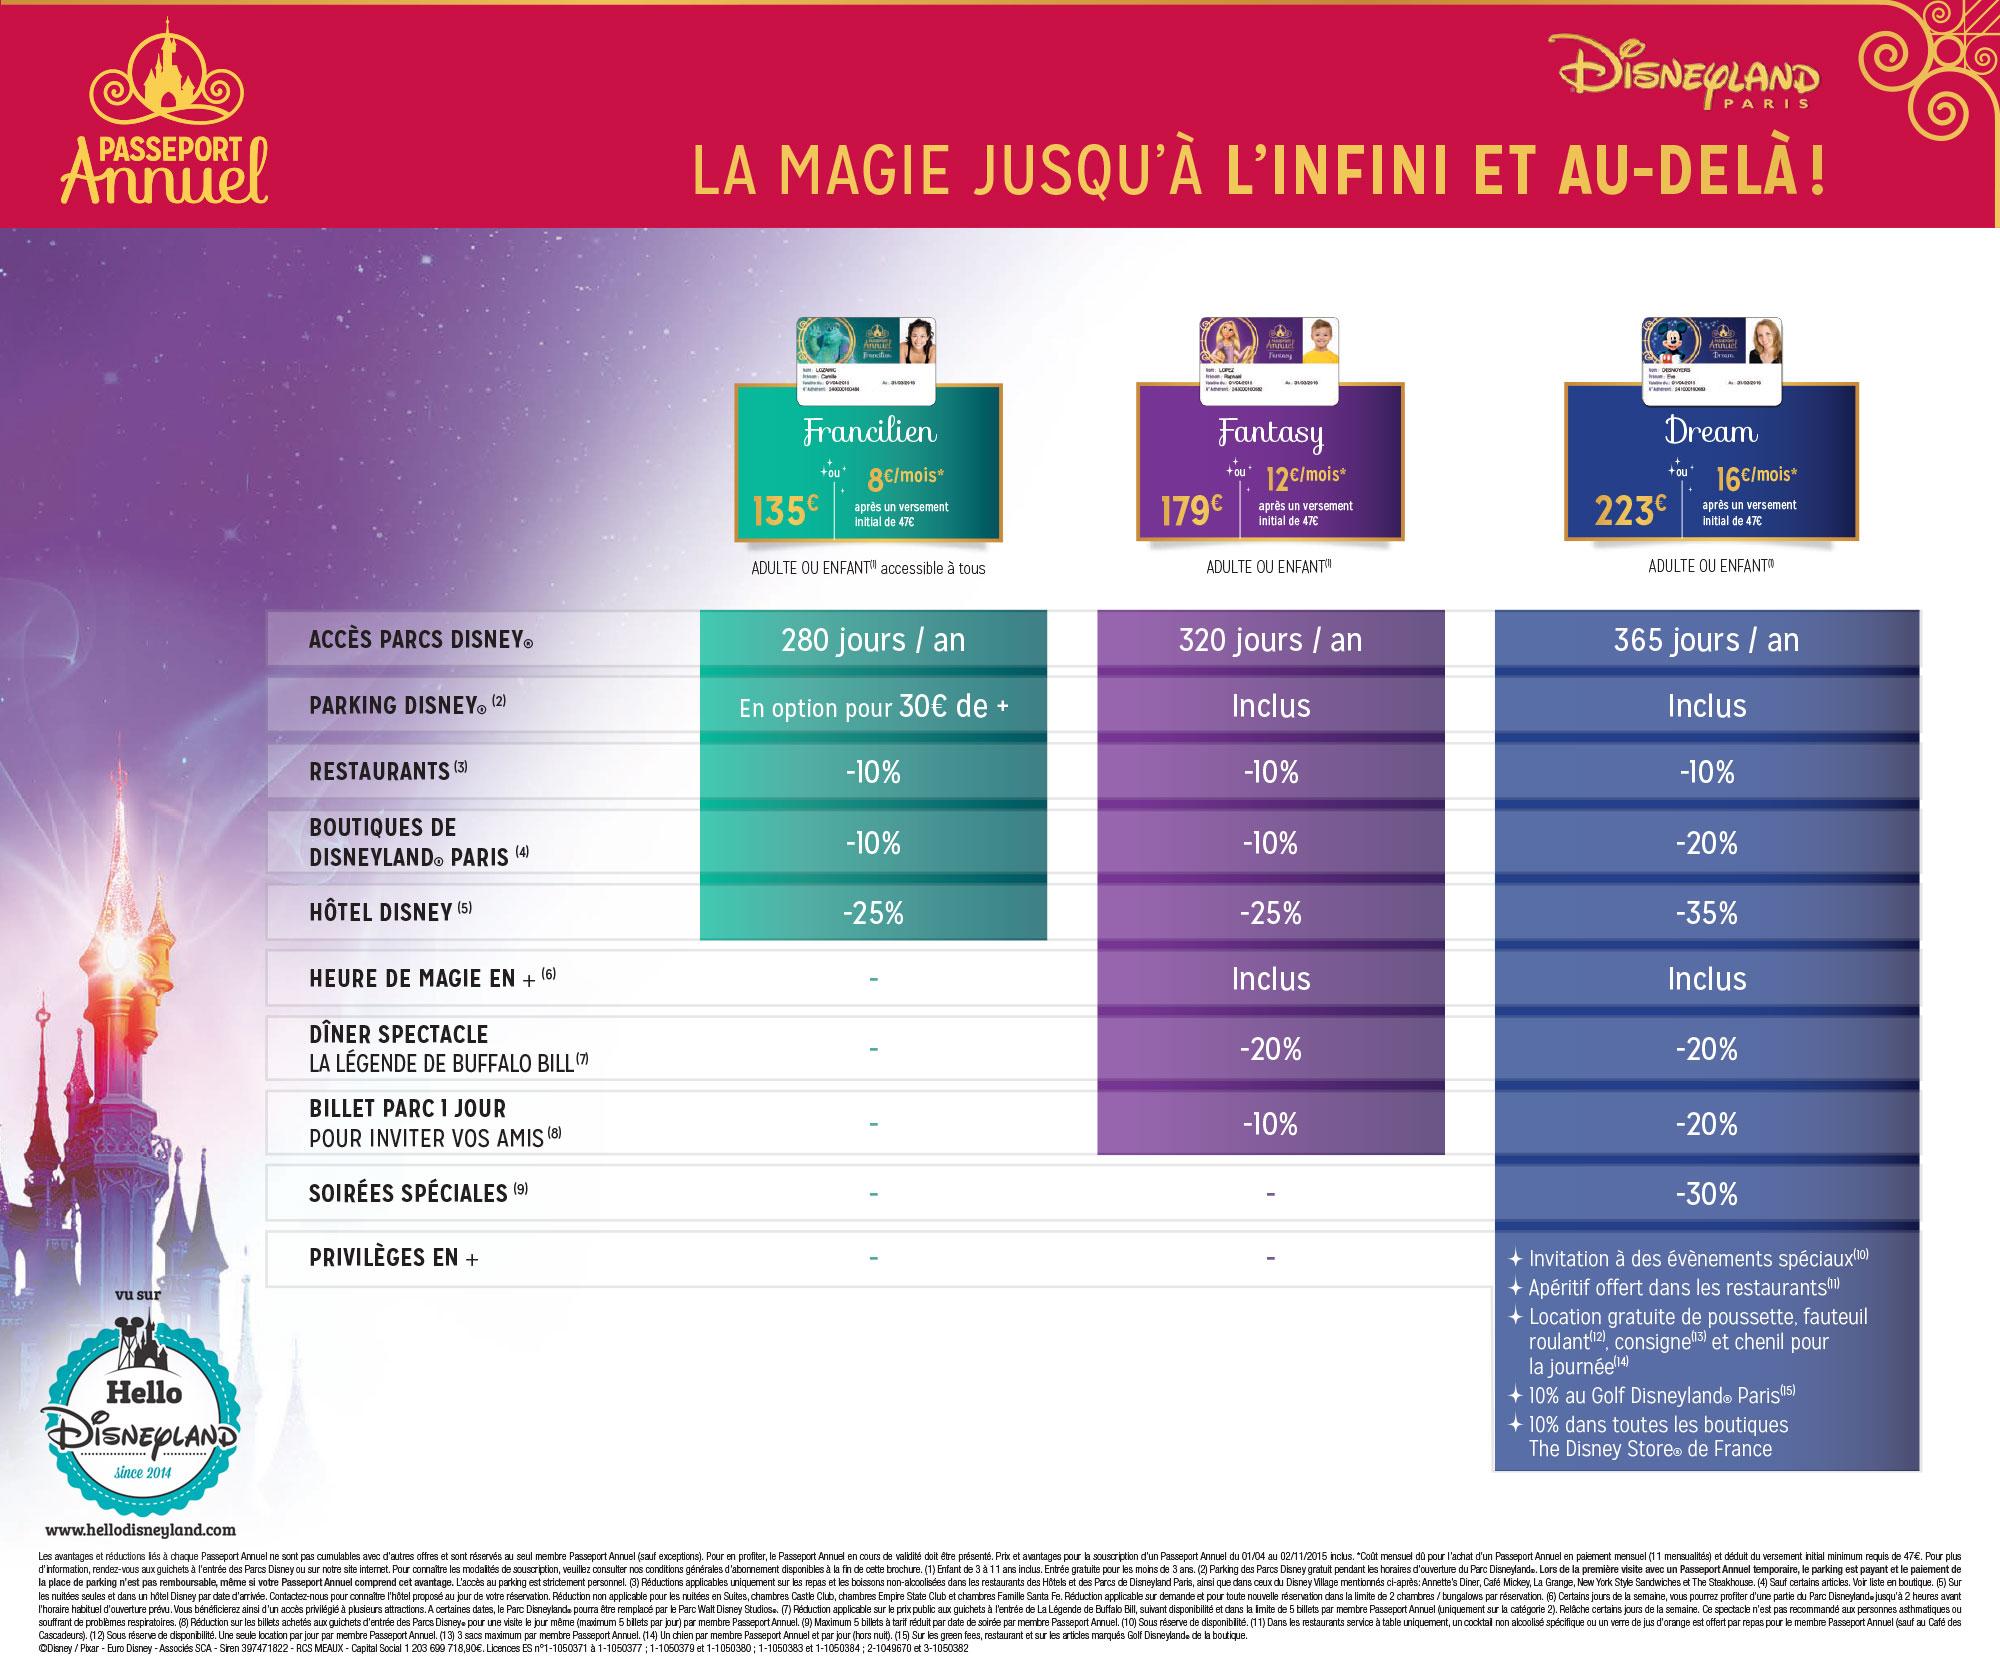 Tarifs Passeports Annuels Disneyland Paris 2015